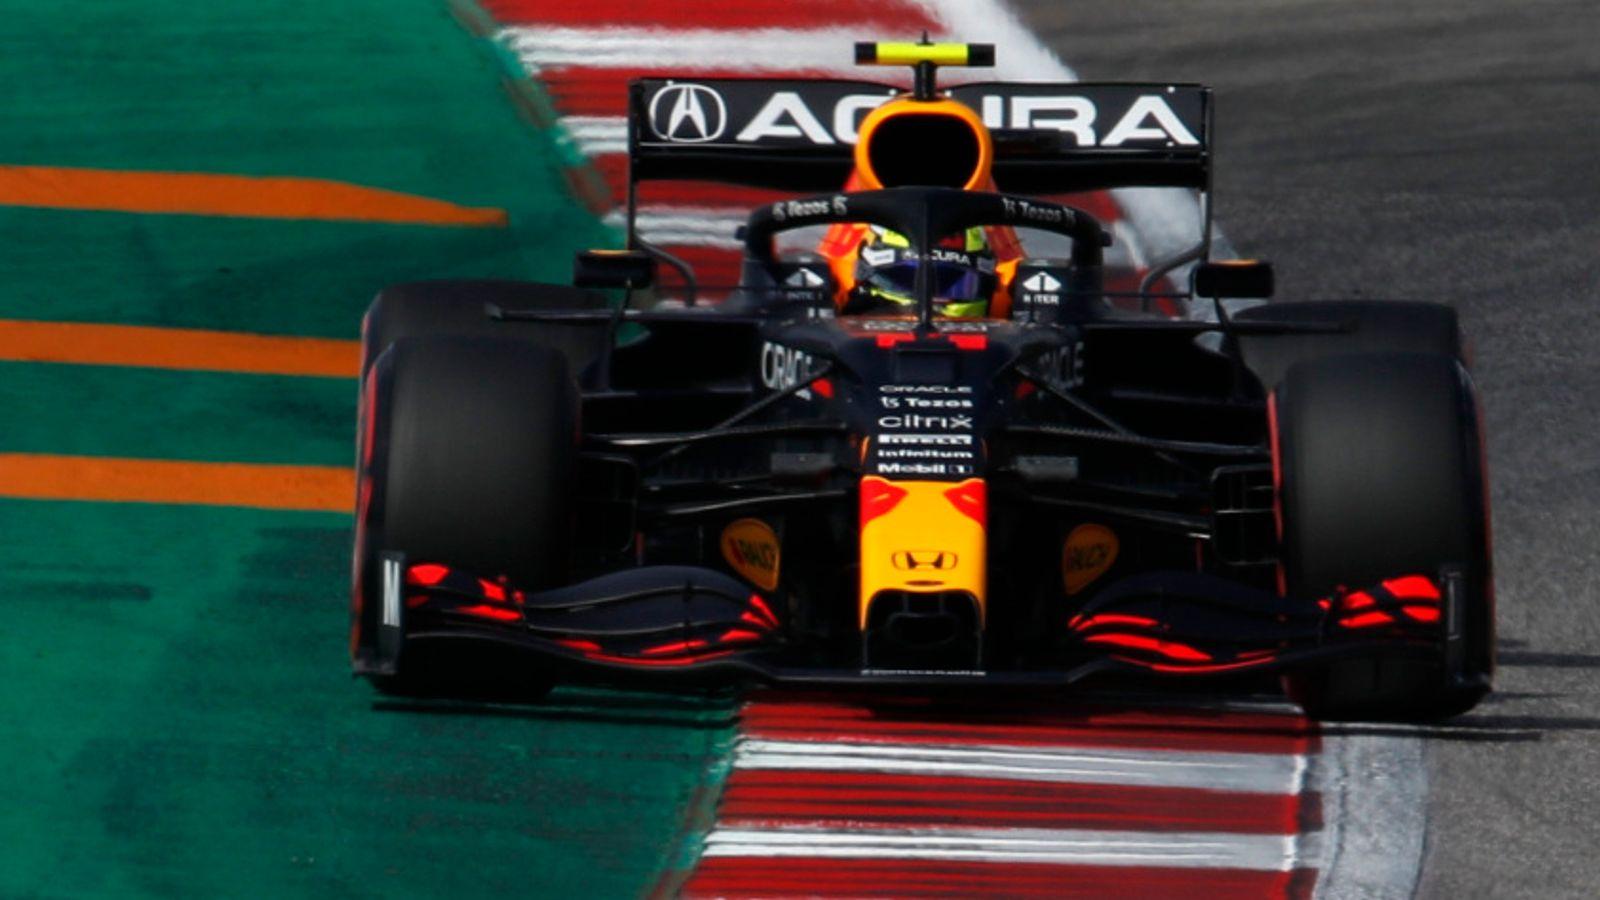 United States GP: Sergio Perez tops Practice Three as Max Verstappen, Lewis Hamilton see laps deleted